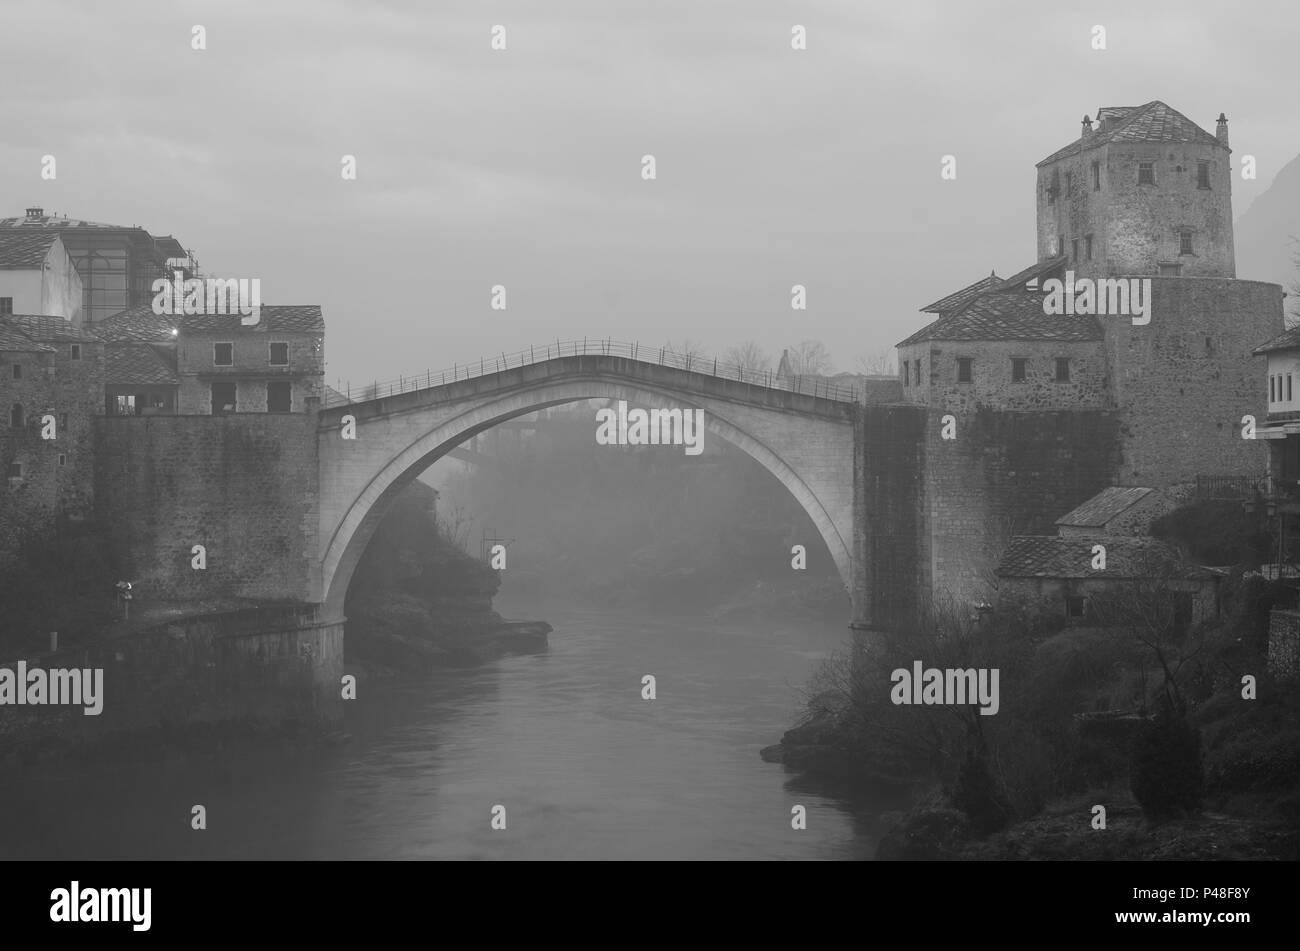 Old bridge in Mostar, Bosnia and Herzegovina - Stock Image